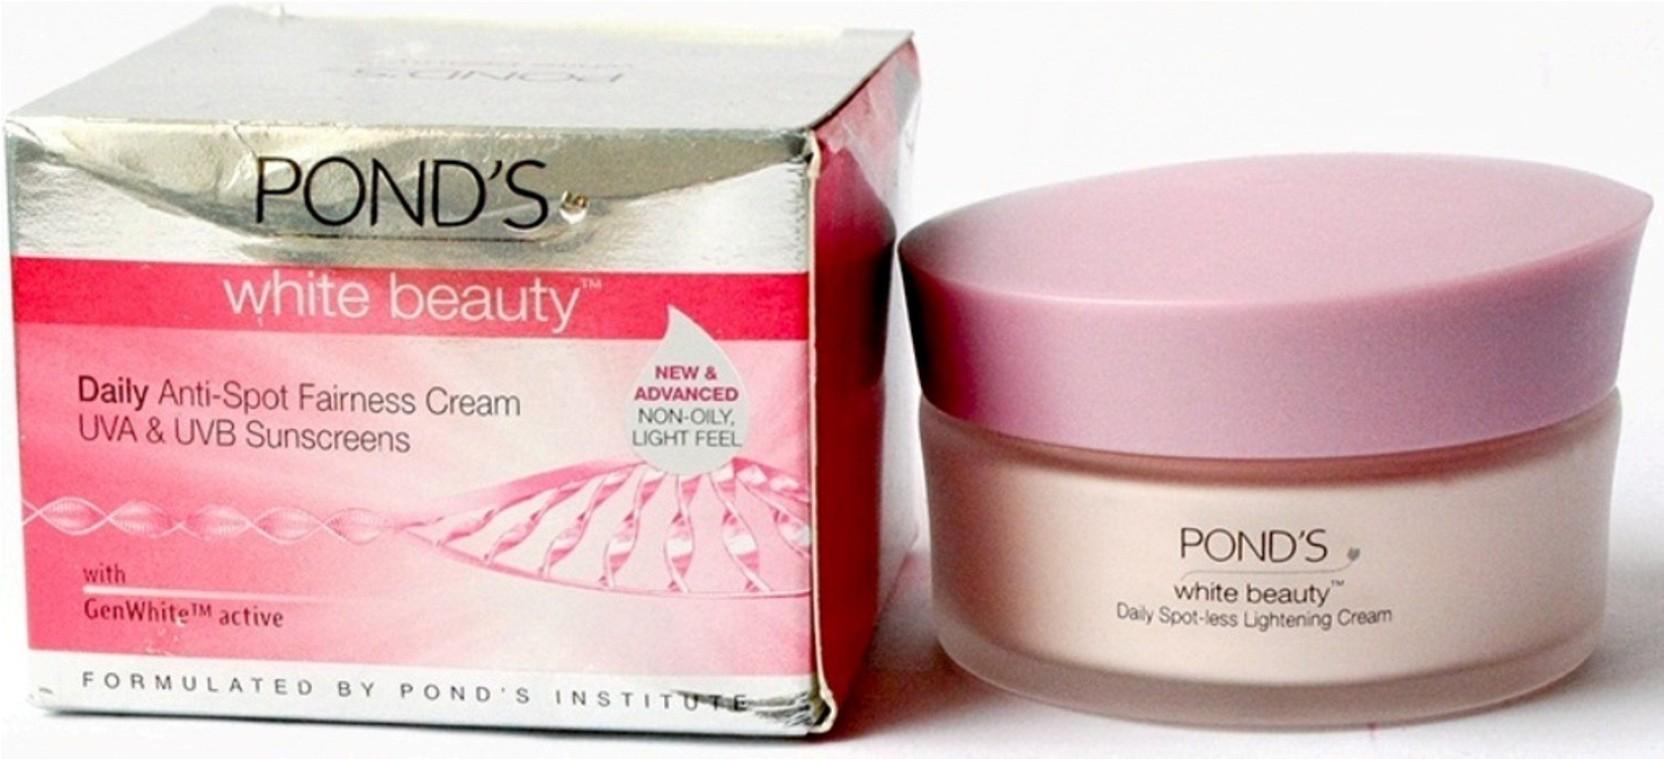 Ponds White Beauty Daily Anti Spot Fairness Cream Uva Uvb Price Package Share